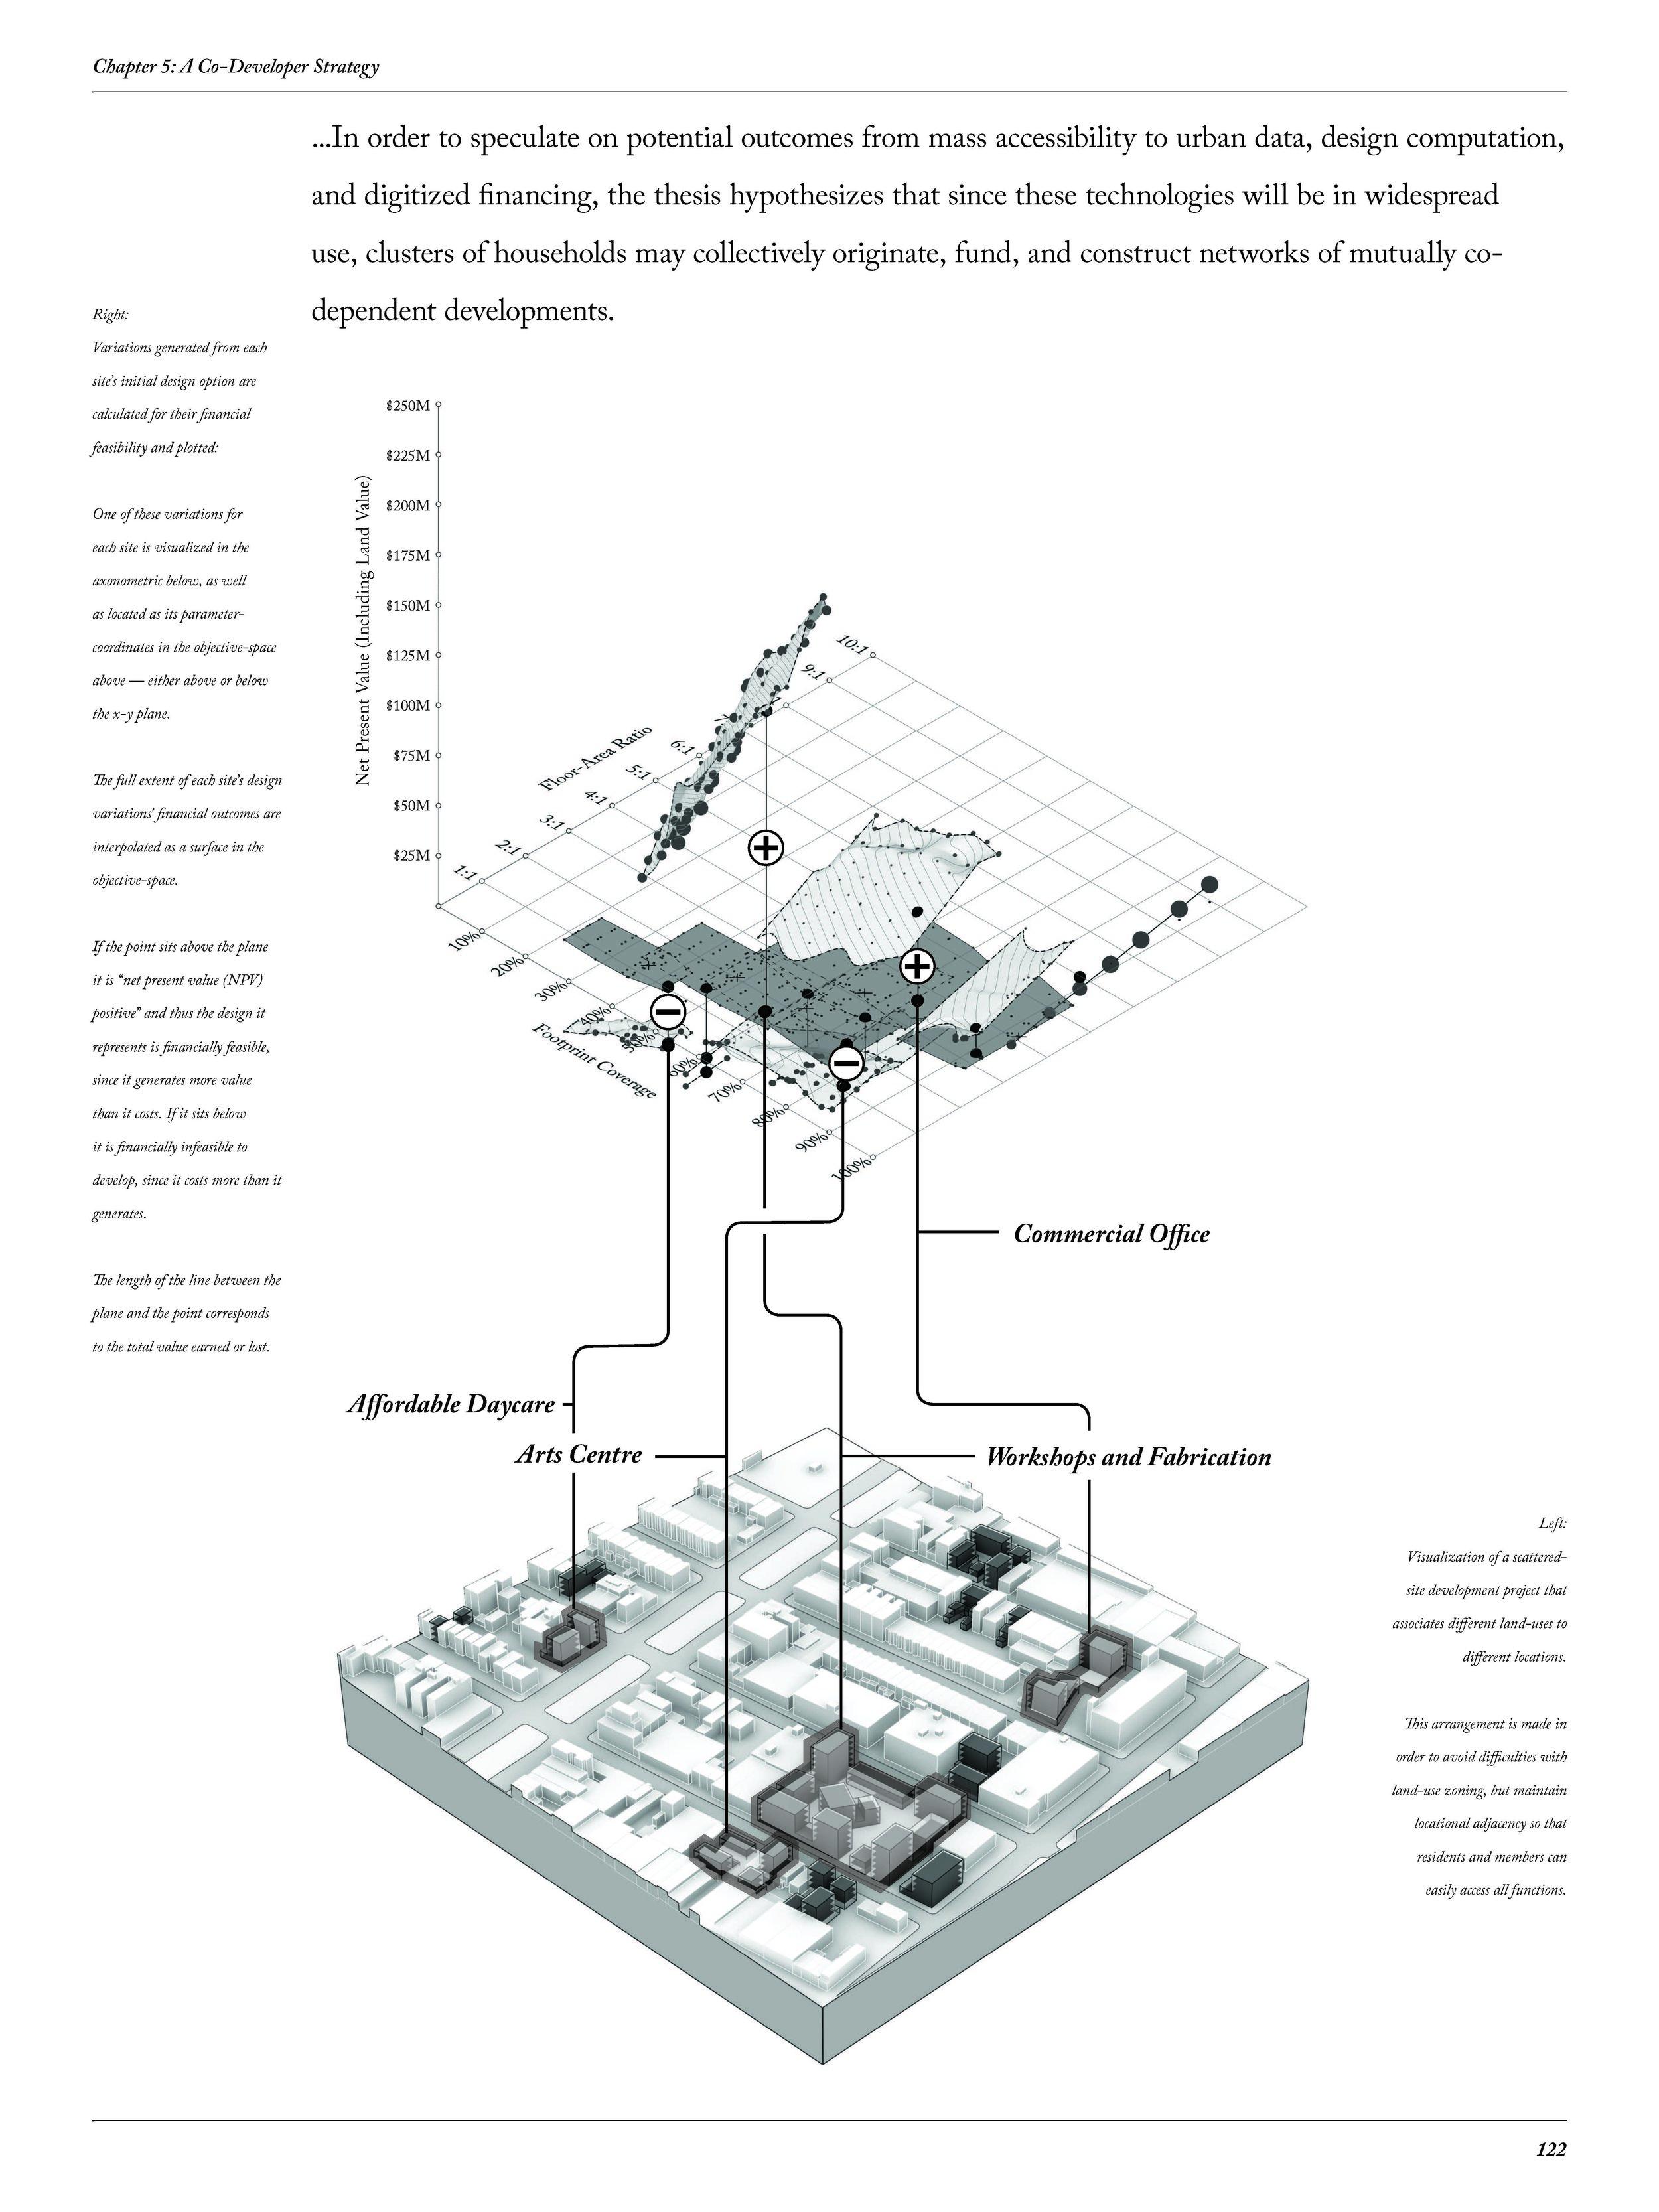 Computing-Co-Op-Development.jpg